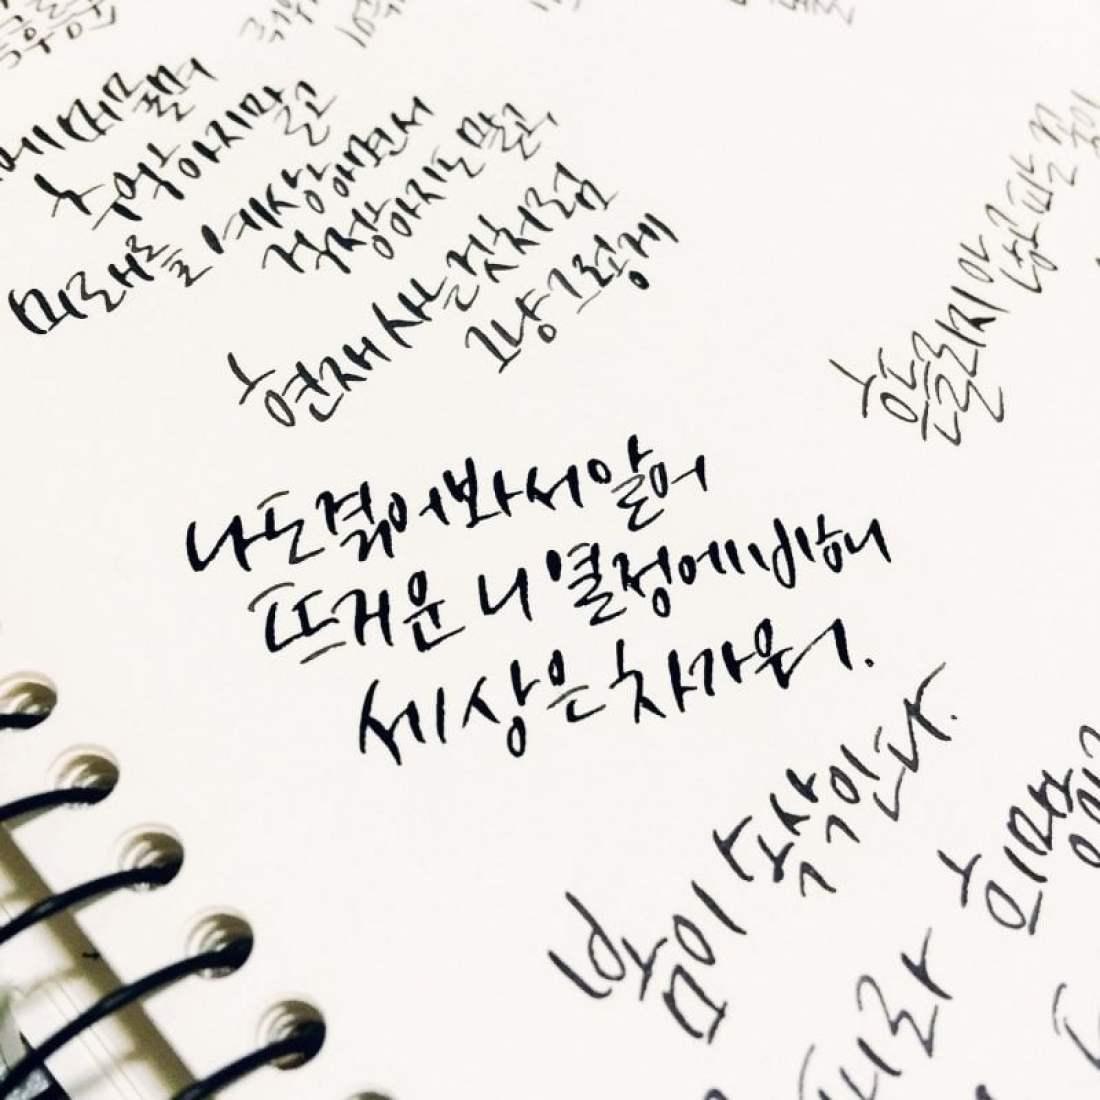 Lista de nomes coreanos masculinos e femininos